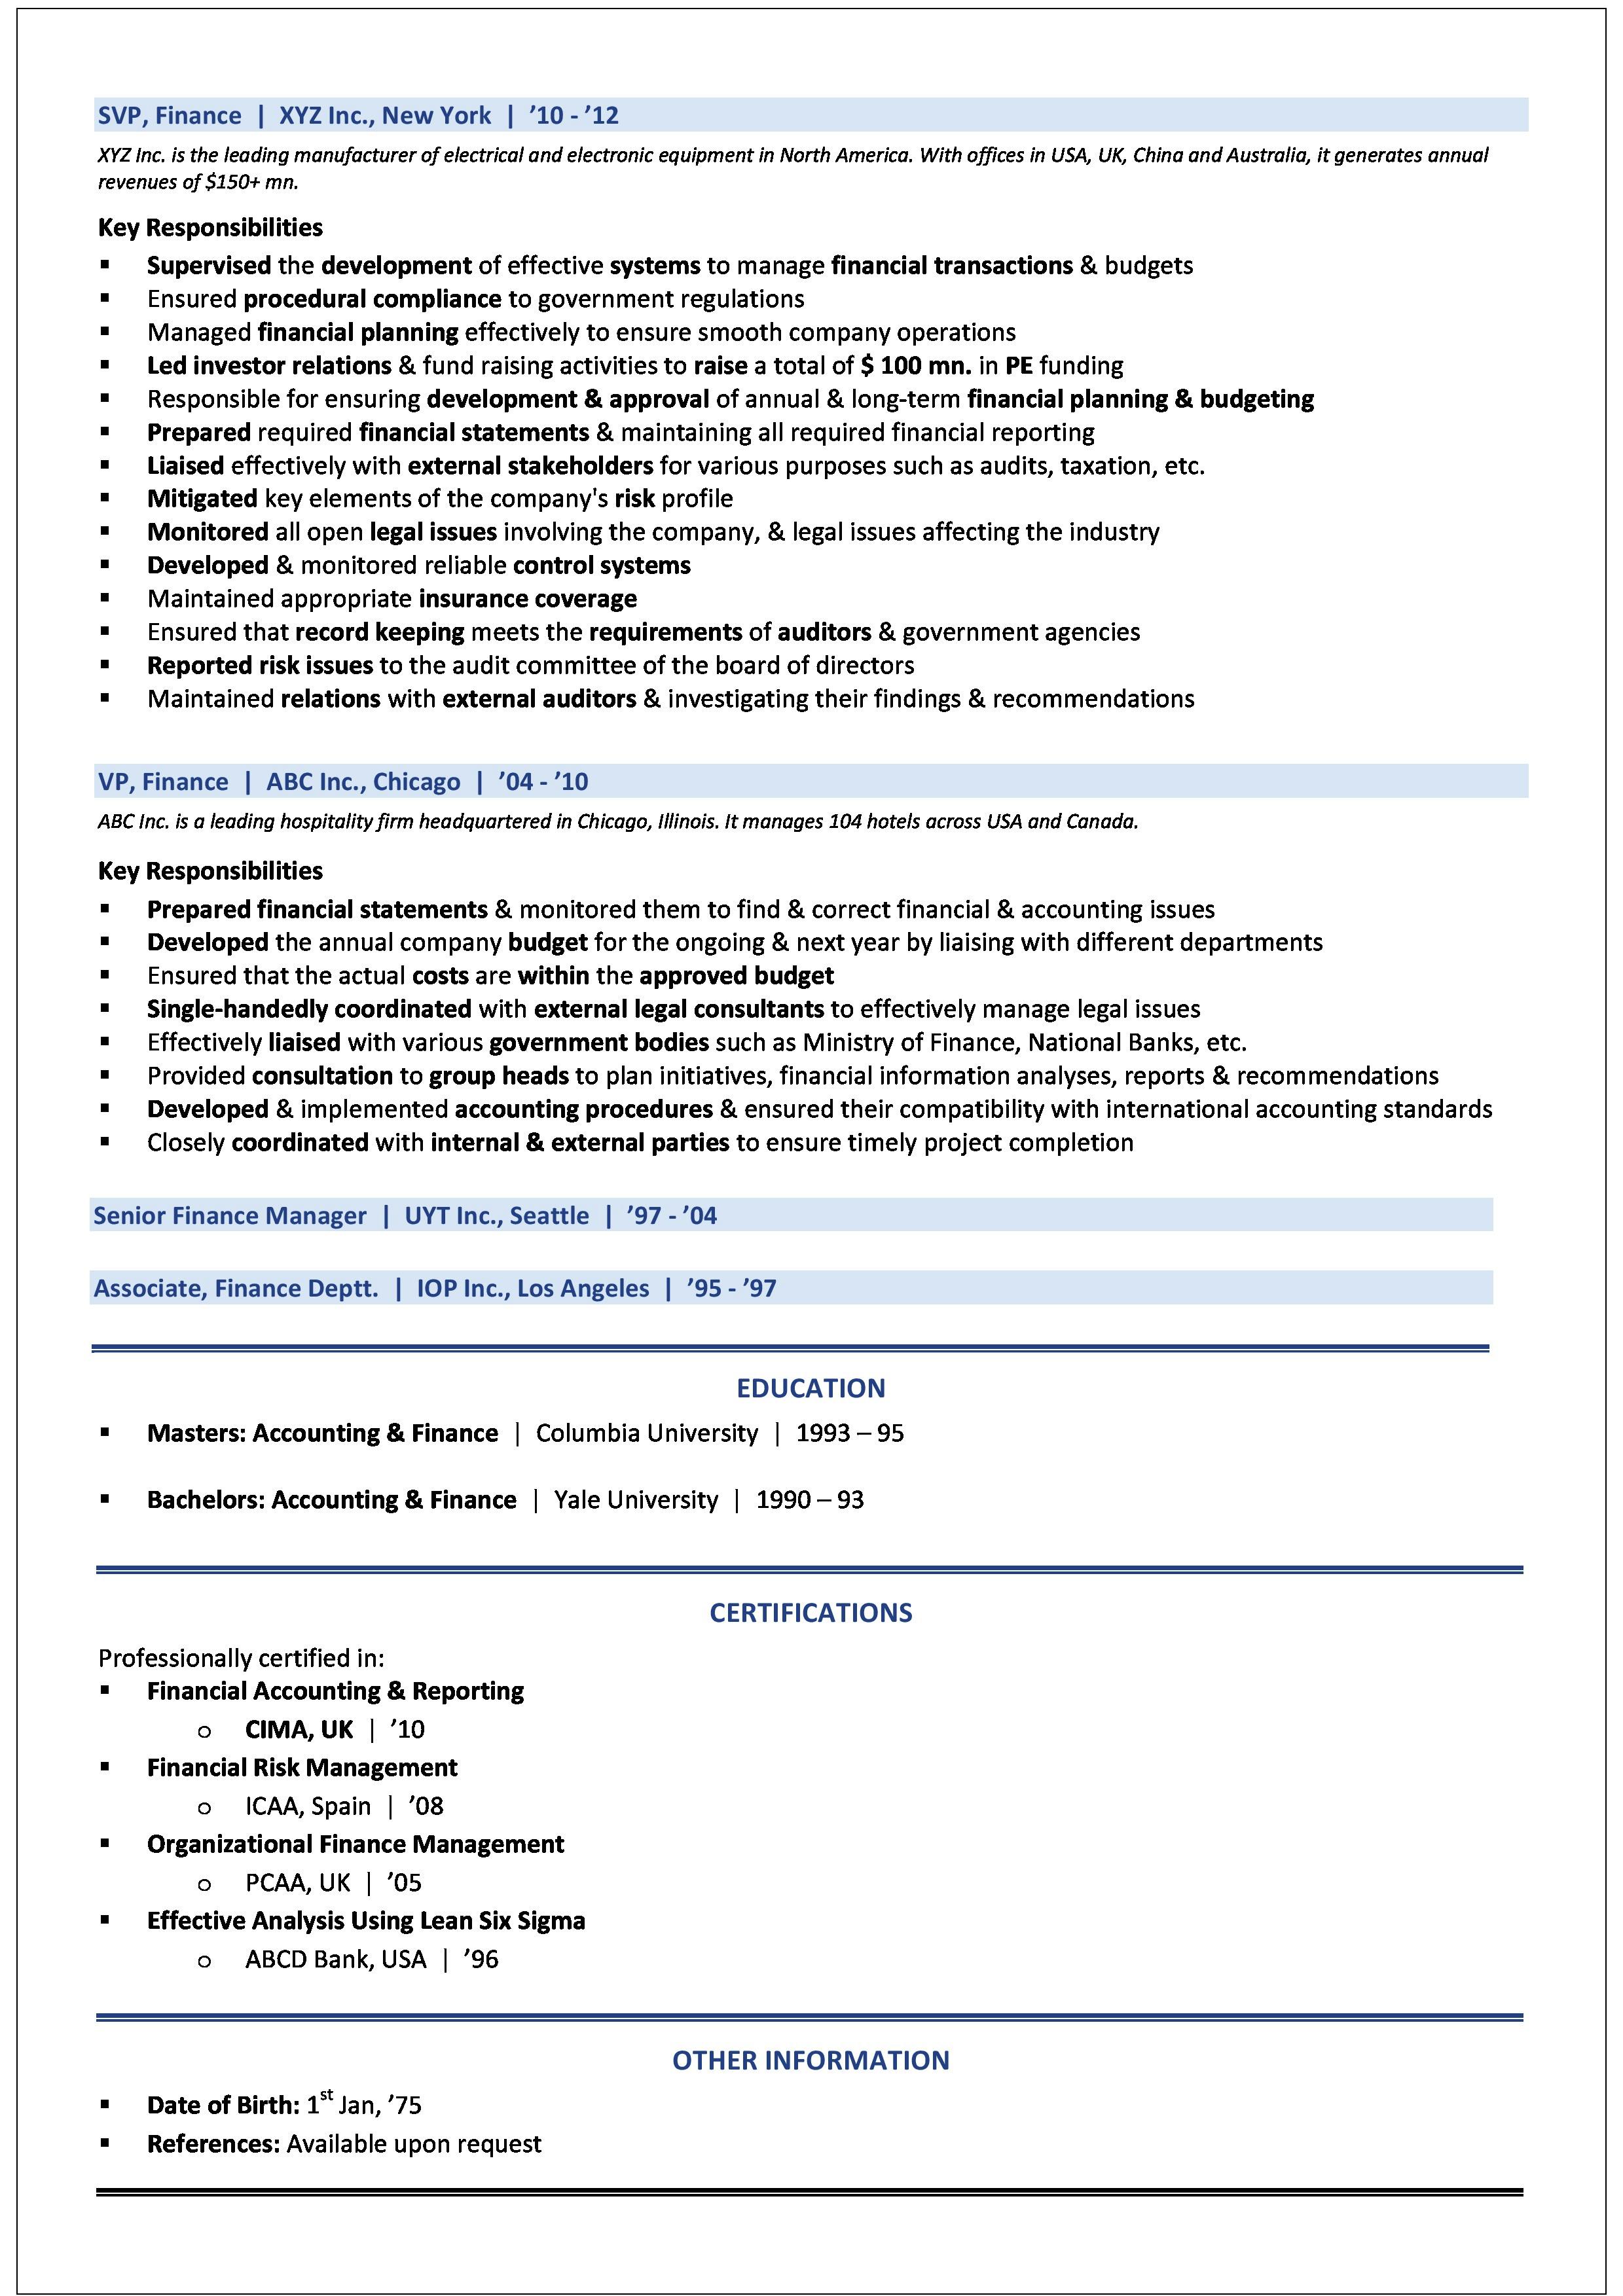 Sample CV - CFO - 2